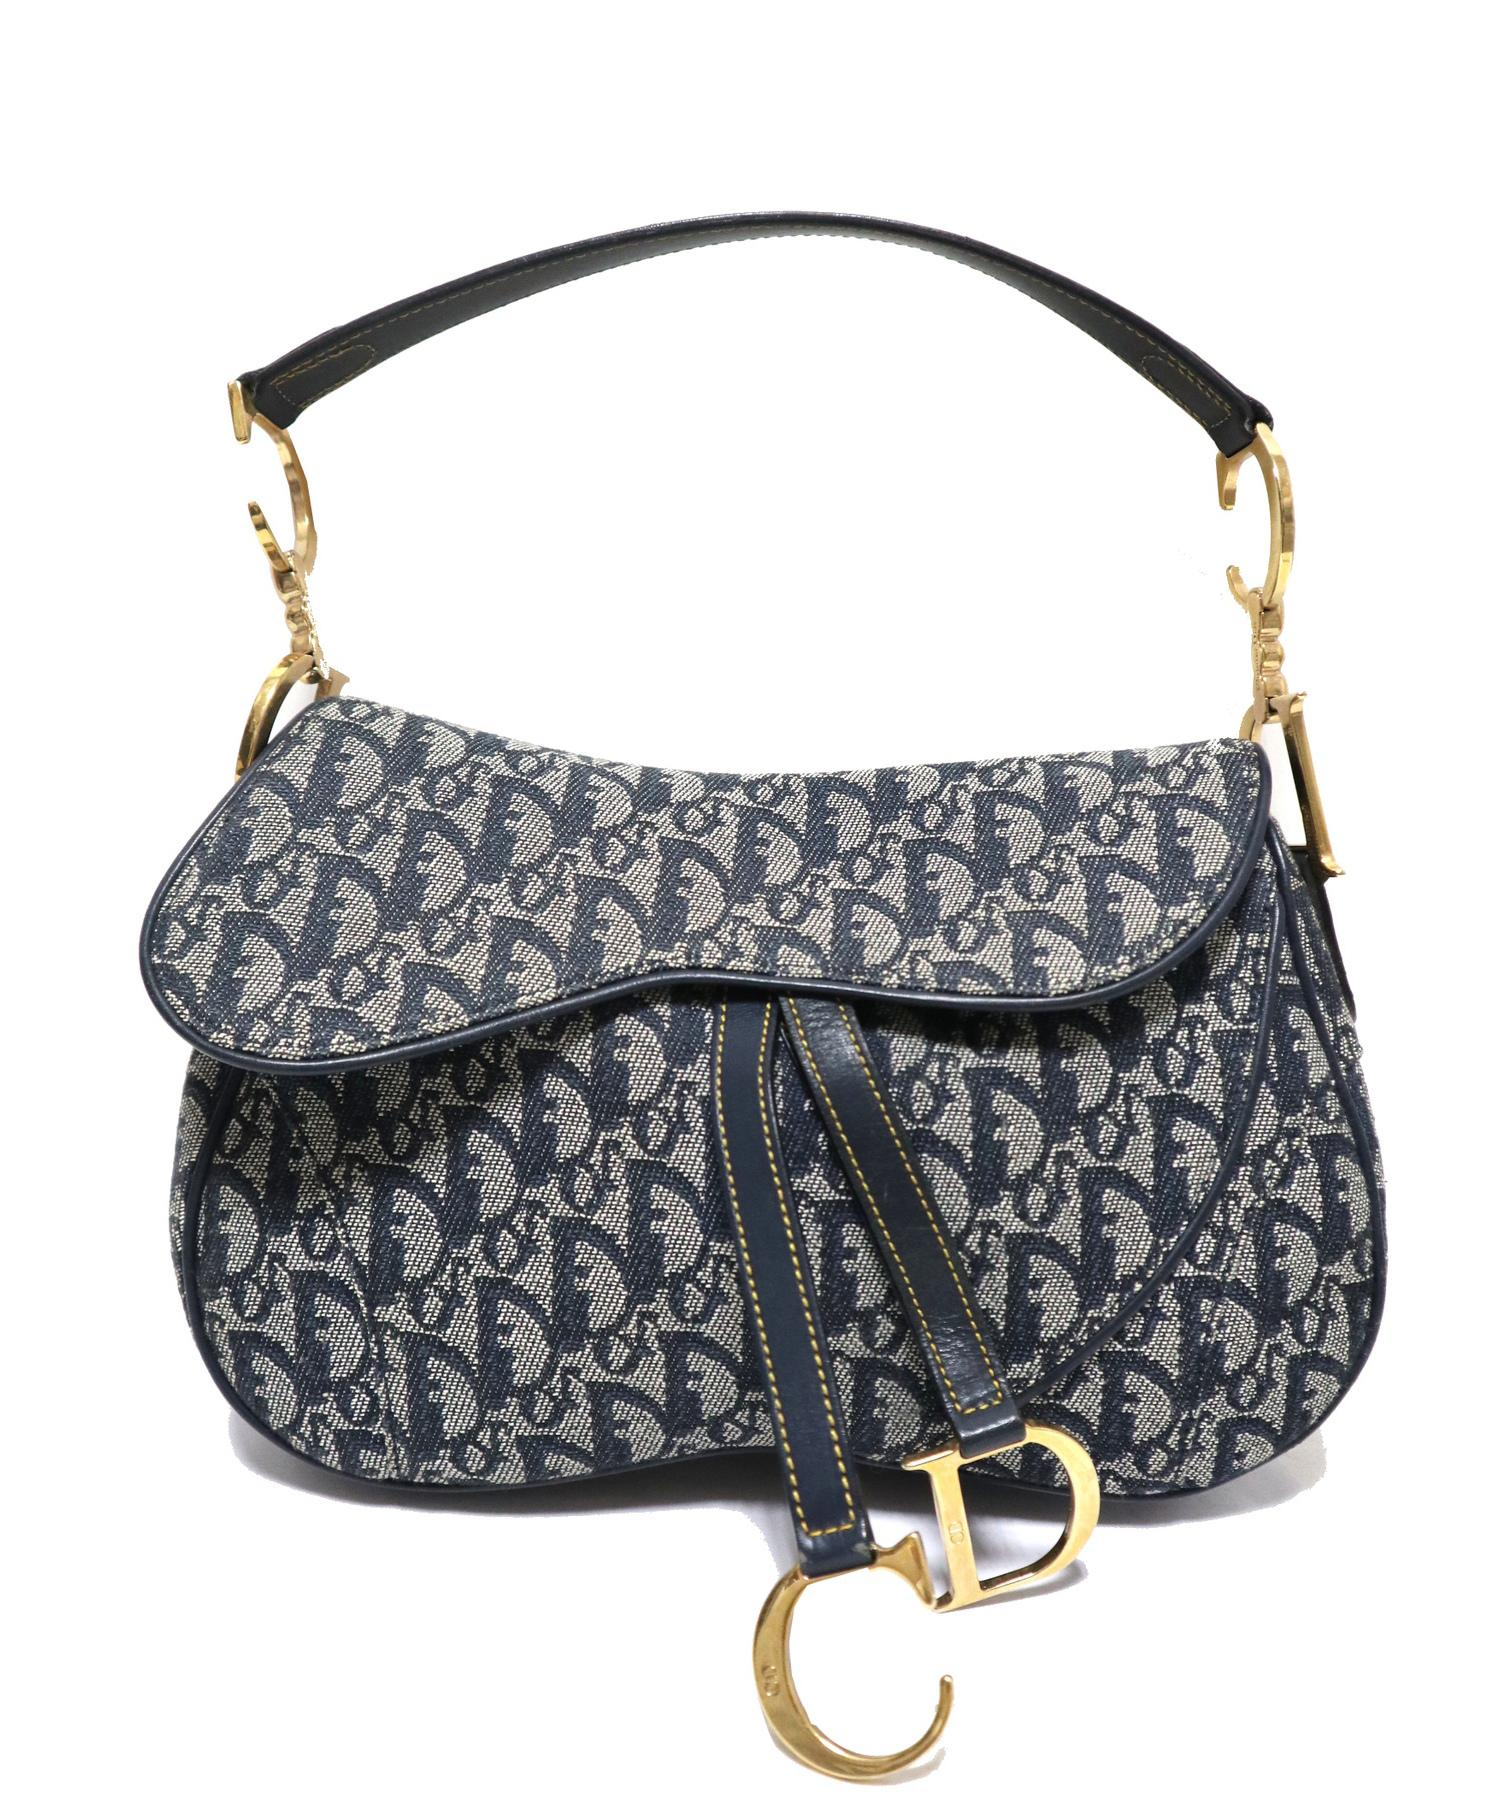 save off fd4b3 be1a8 [中古]Christian Dior(クリスチャン ディオール)のレディース バッグ サドルショルダーバッグ